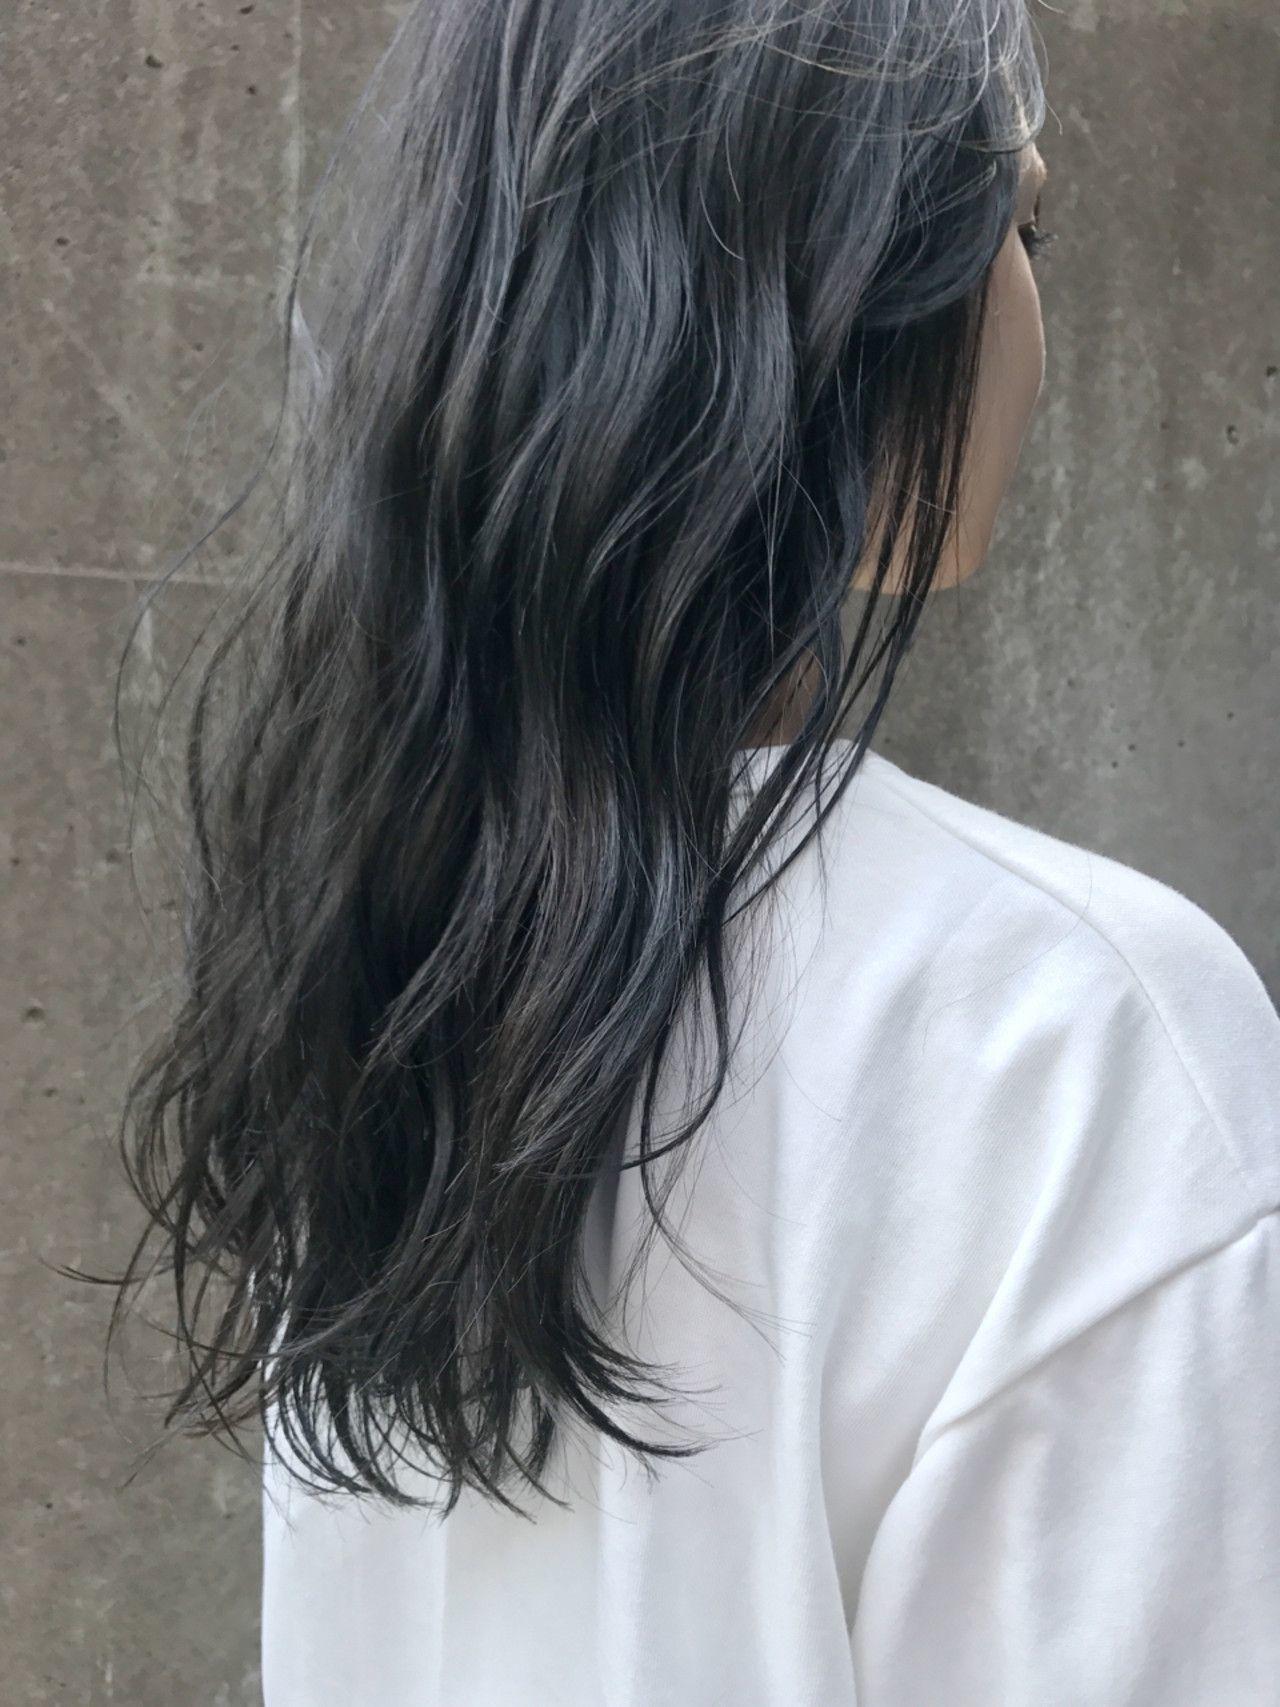 Hair おしゃれまとめの人気アイデア Pinterest Yg 秋 ヘアカラー